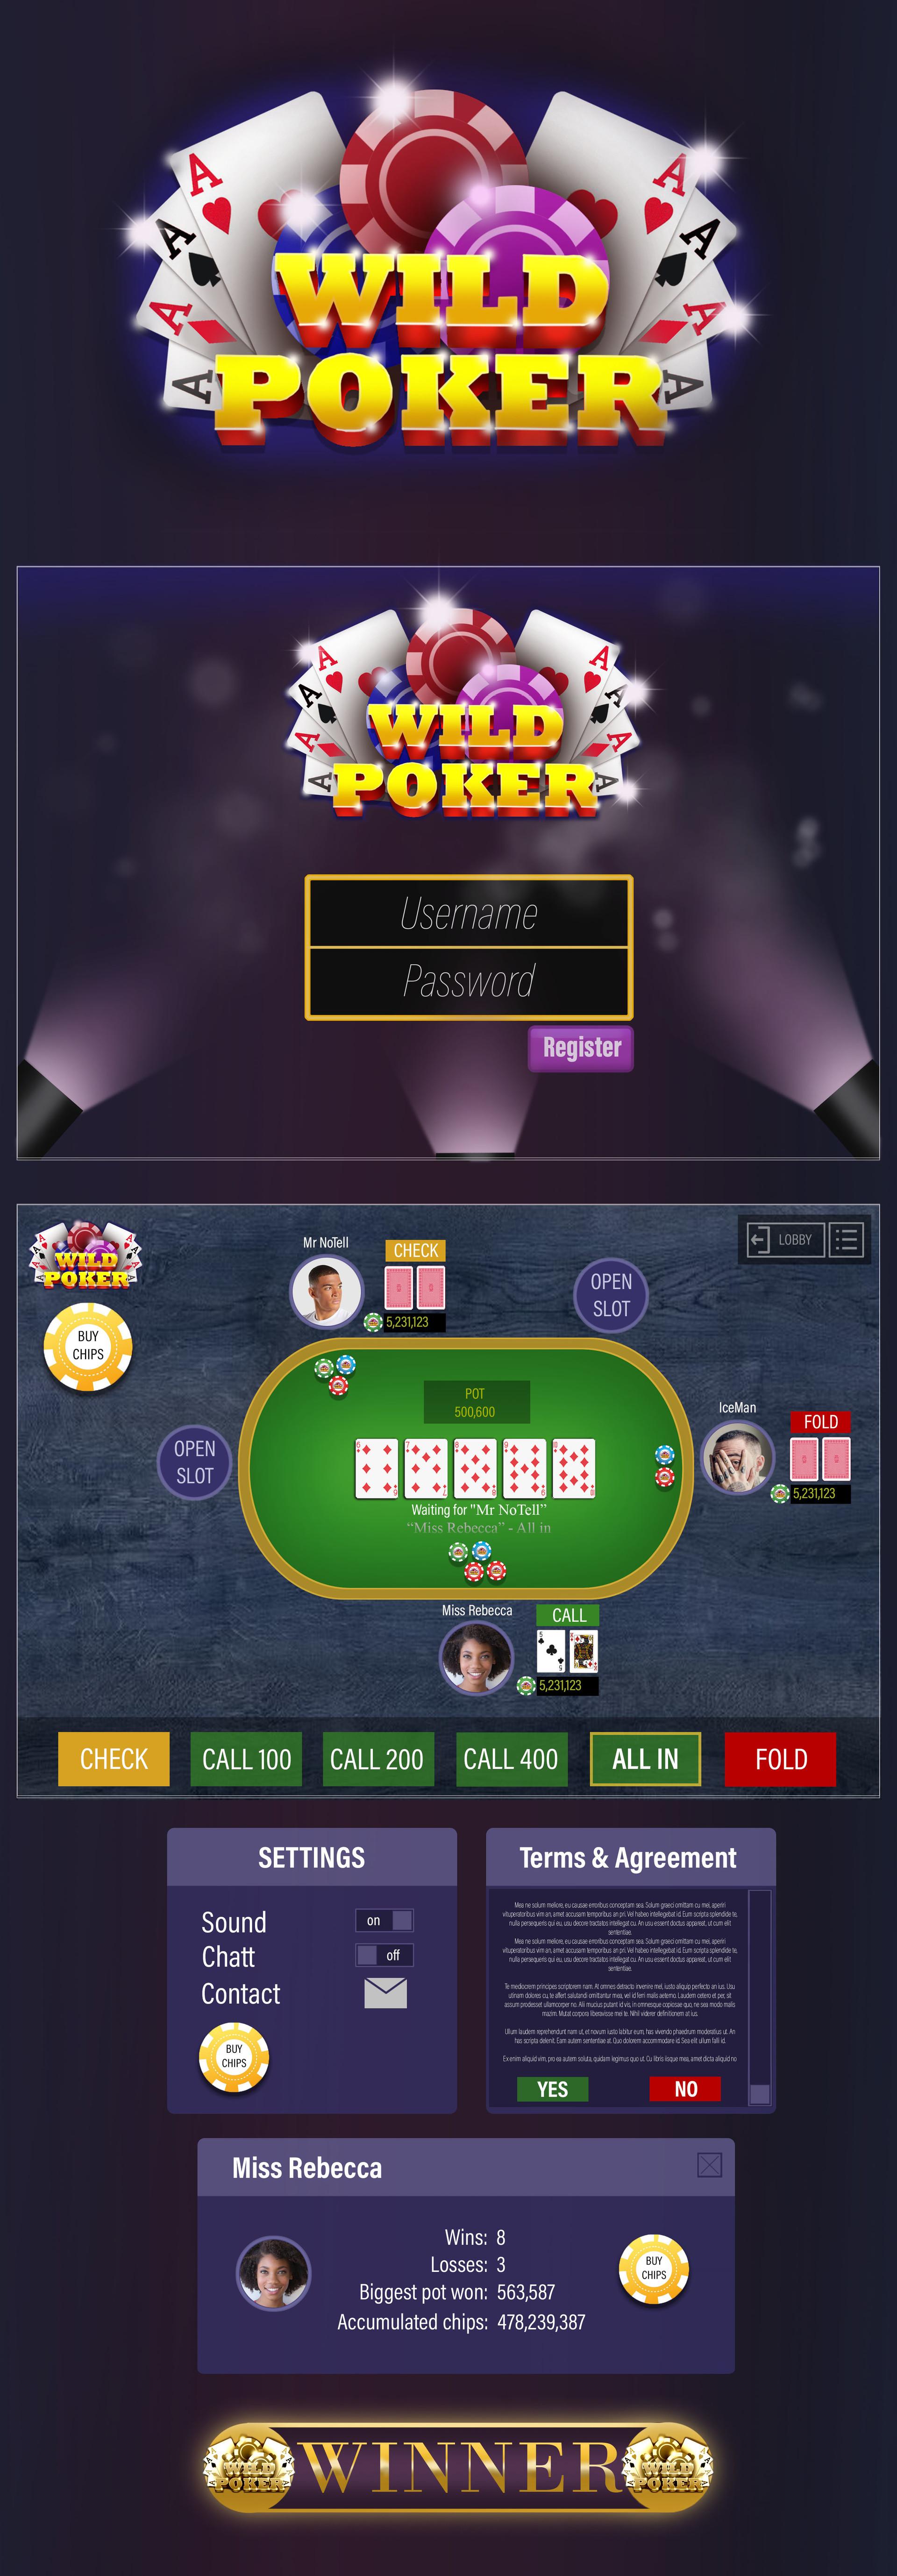 slots mobile casino no deposit bonus codes